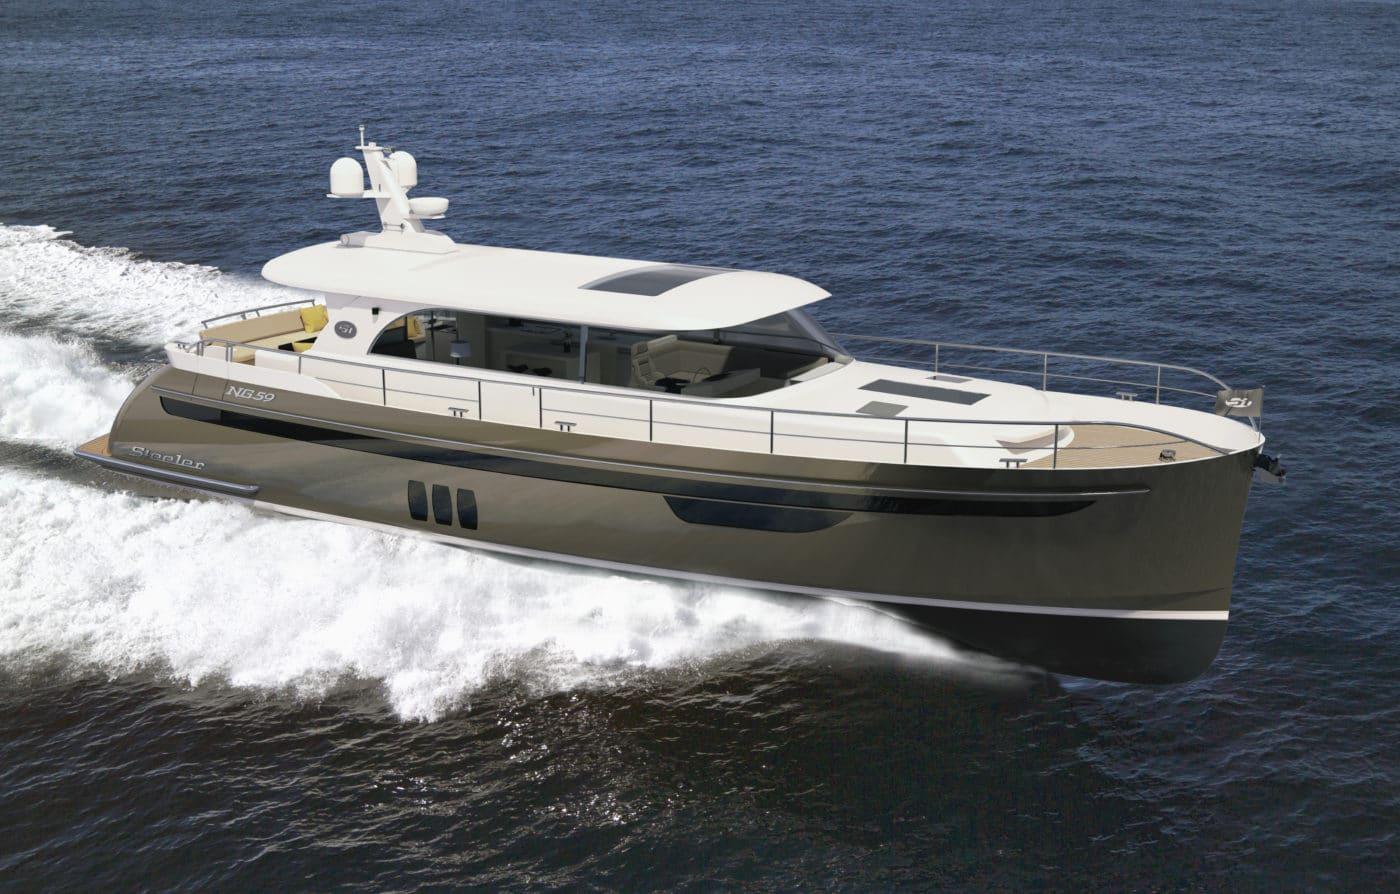 STEELER 61S offshore NNY: under development